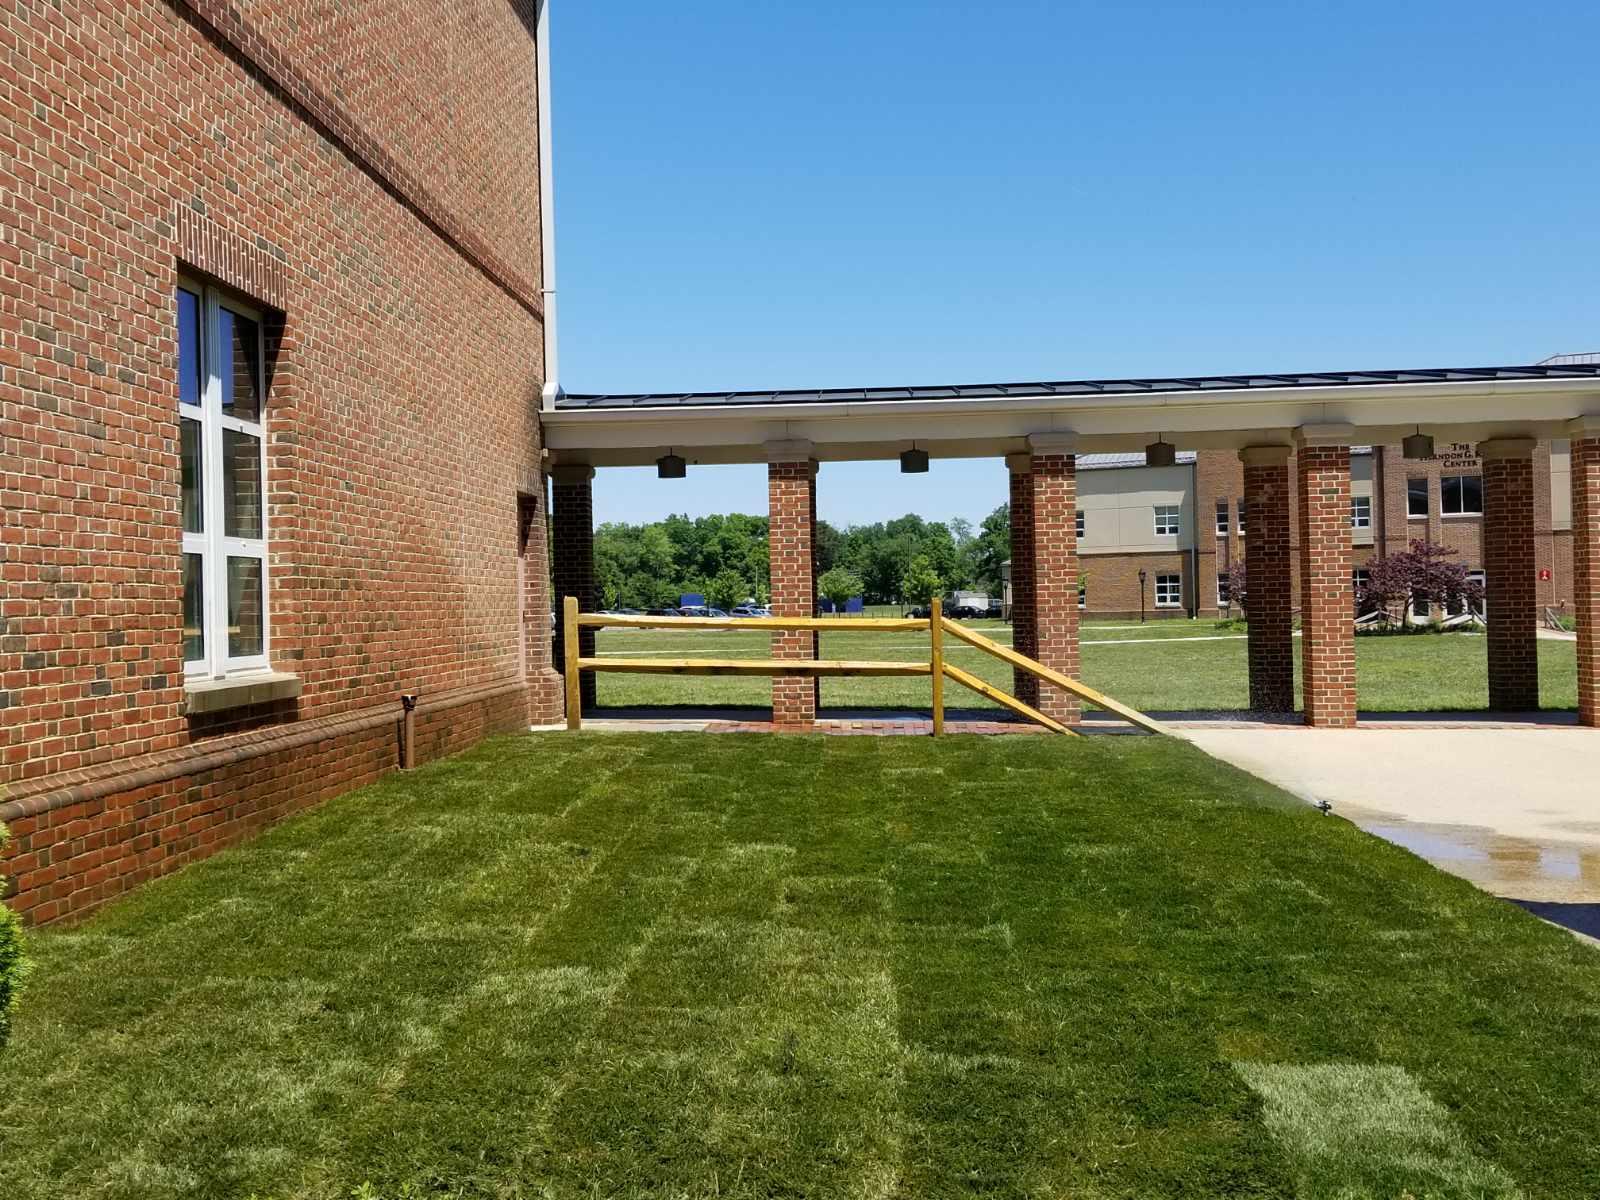 Sod install in Crownsville MD